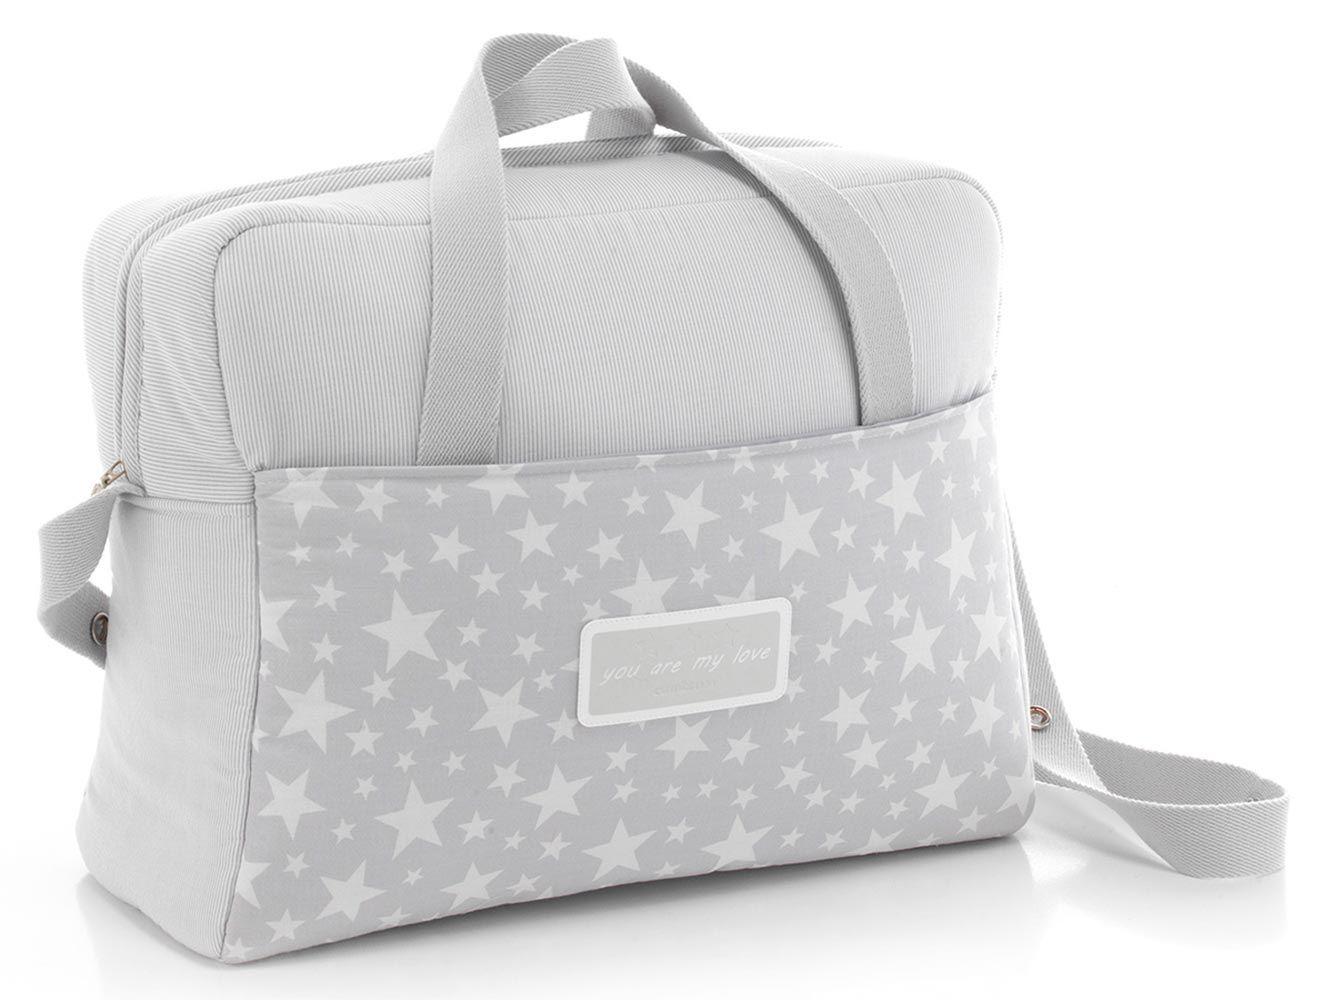 Cambrass Star Maternity Bag Grey | Mamsen & Mini | Pinterest